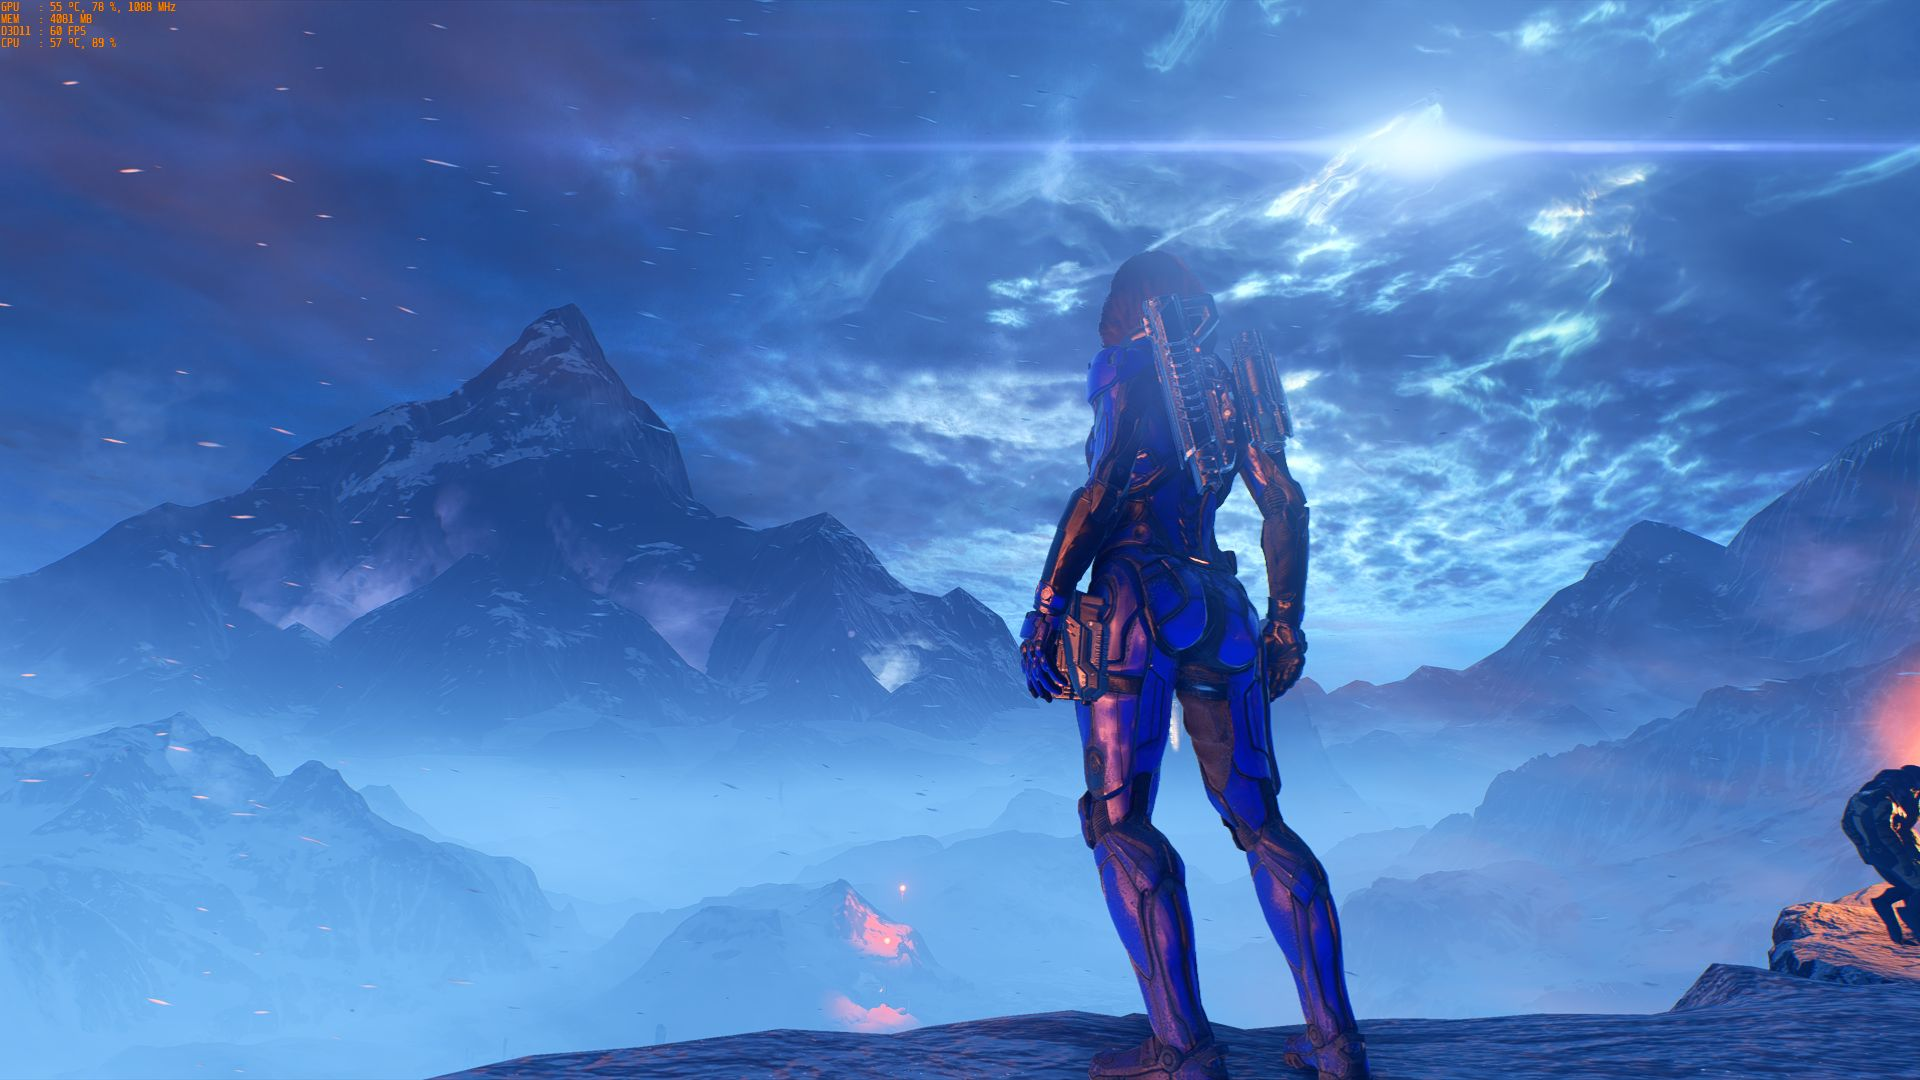 Mass Effect Andromeda Screenshot 2017.07.23 - 19.15.25.70.jpg - Mass Effect: Andromeda